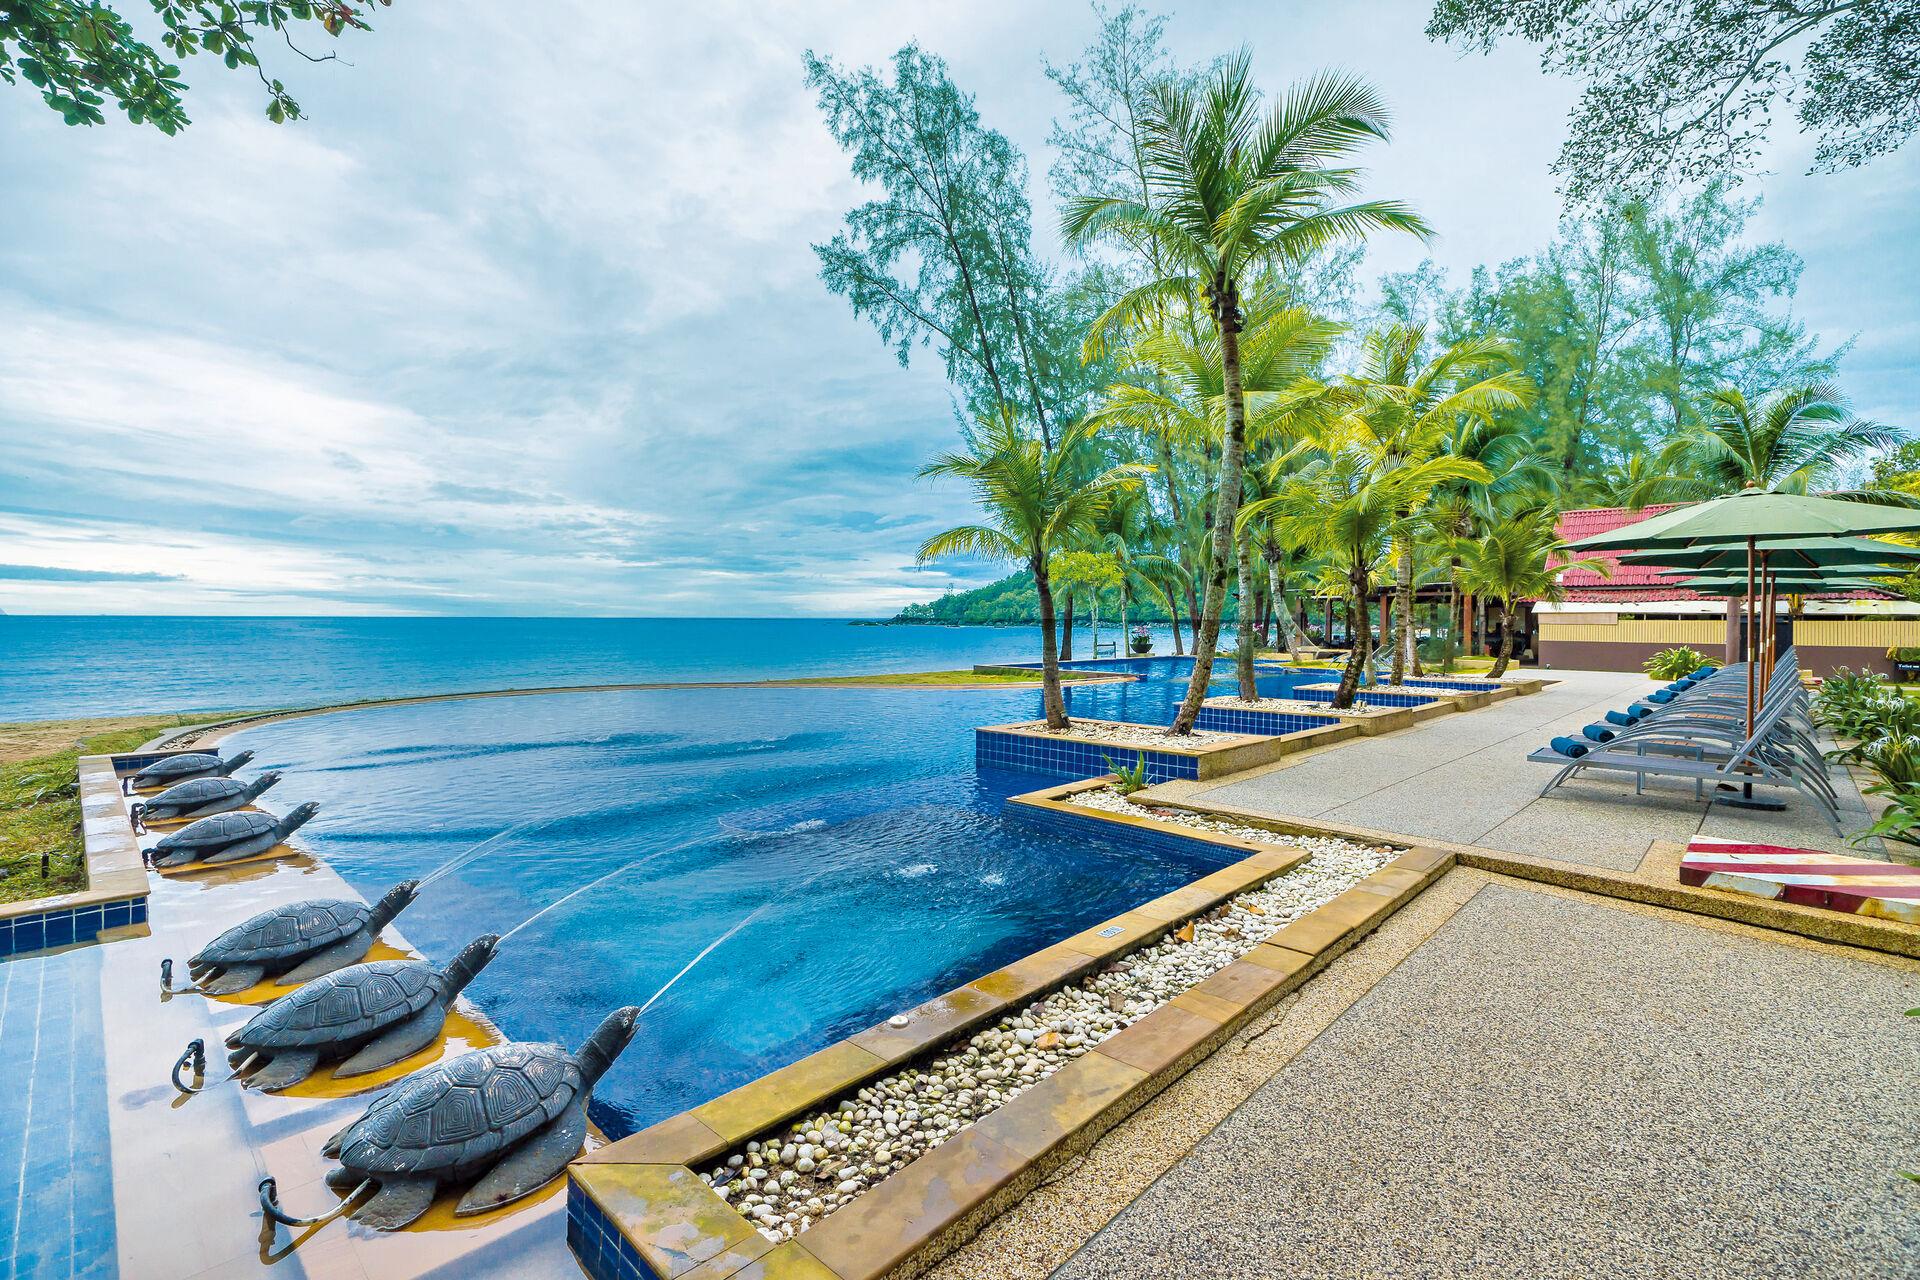 Khaolak Emerald Beach Resort & Spa